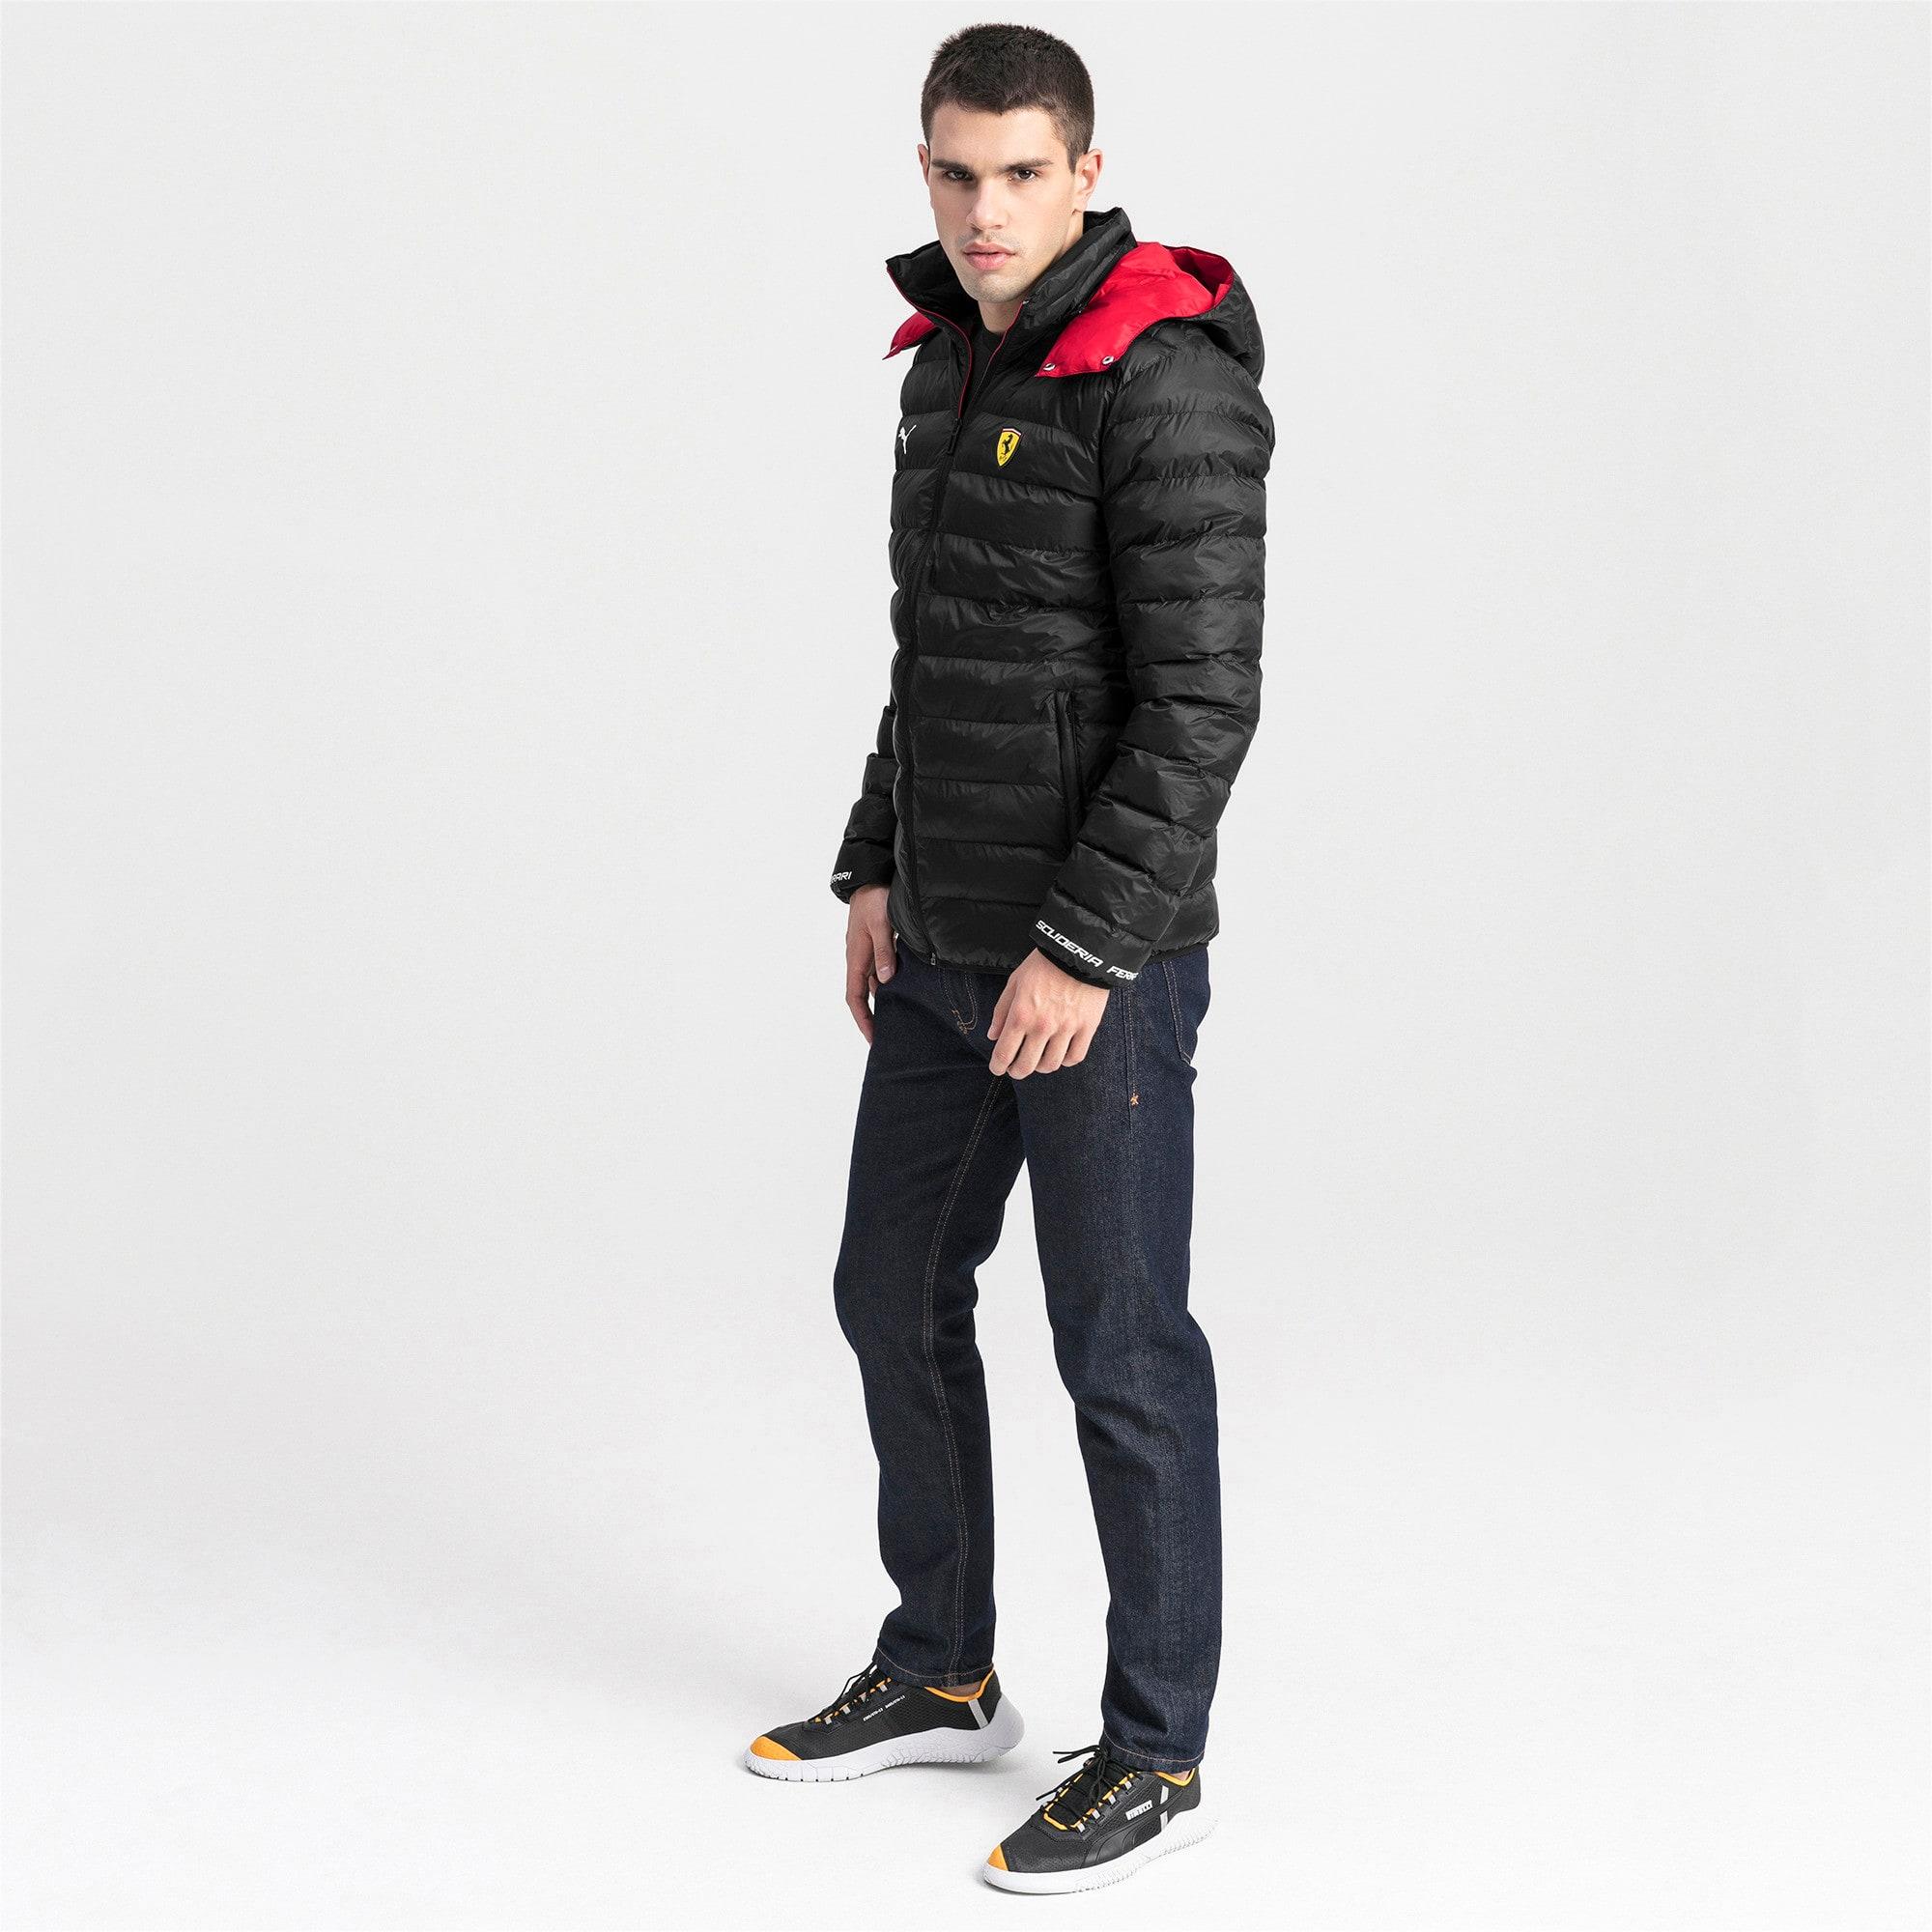 Thumbnail 3 van Ferrari Eco PackLITE jas voor mannen, Puma Black, medium